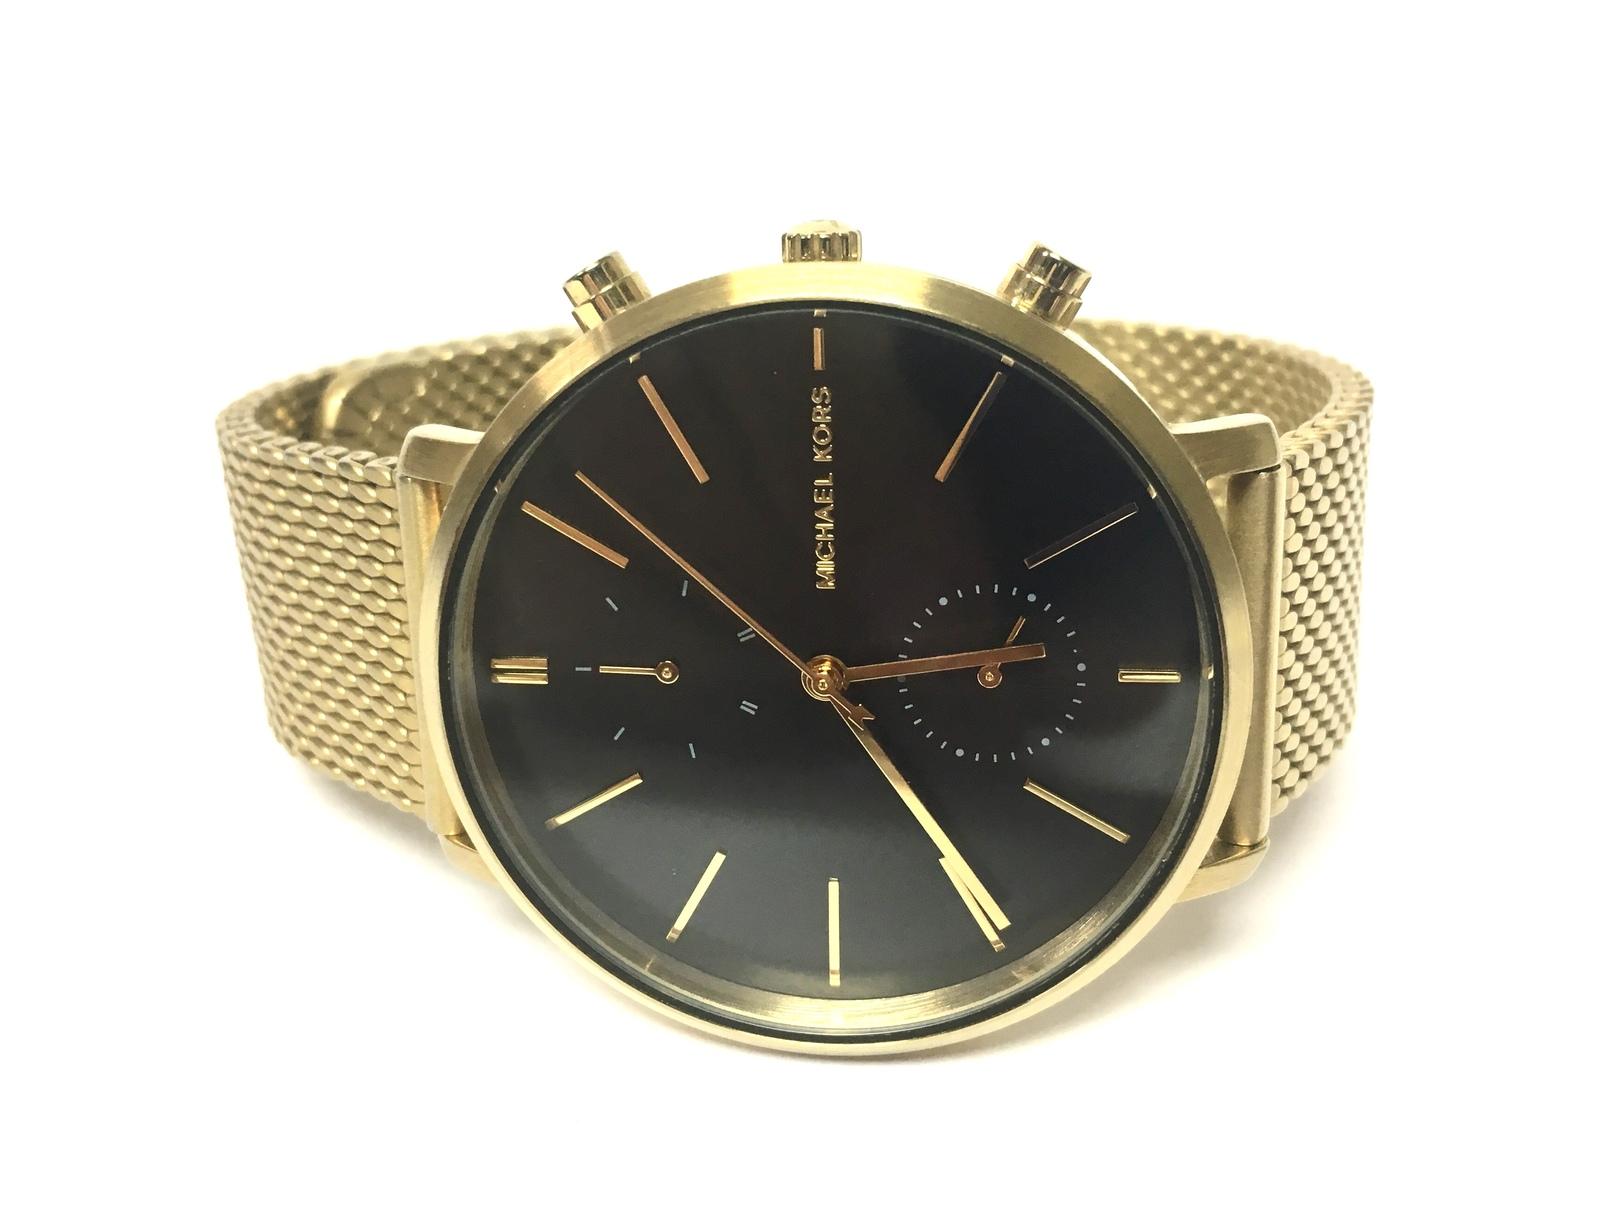 Michael kors Wrist Watch Mk-8503 - $99.00